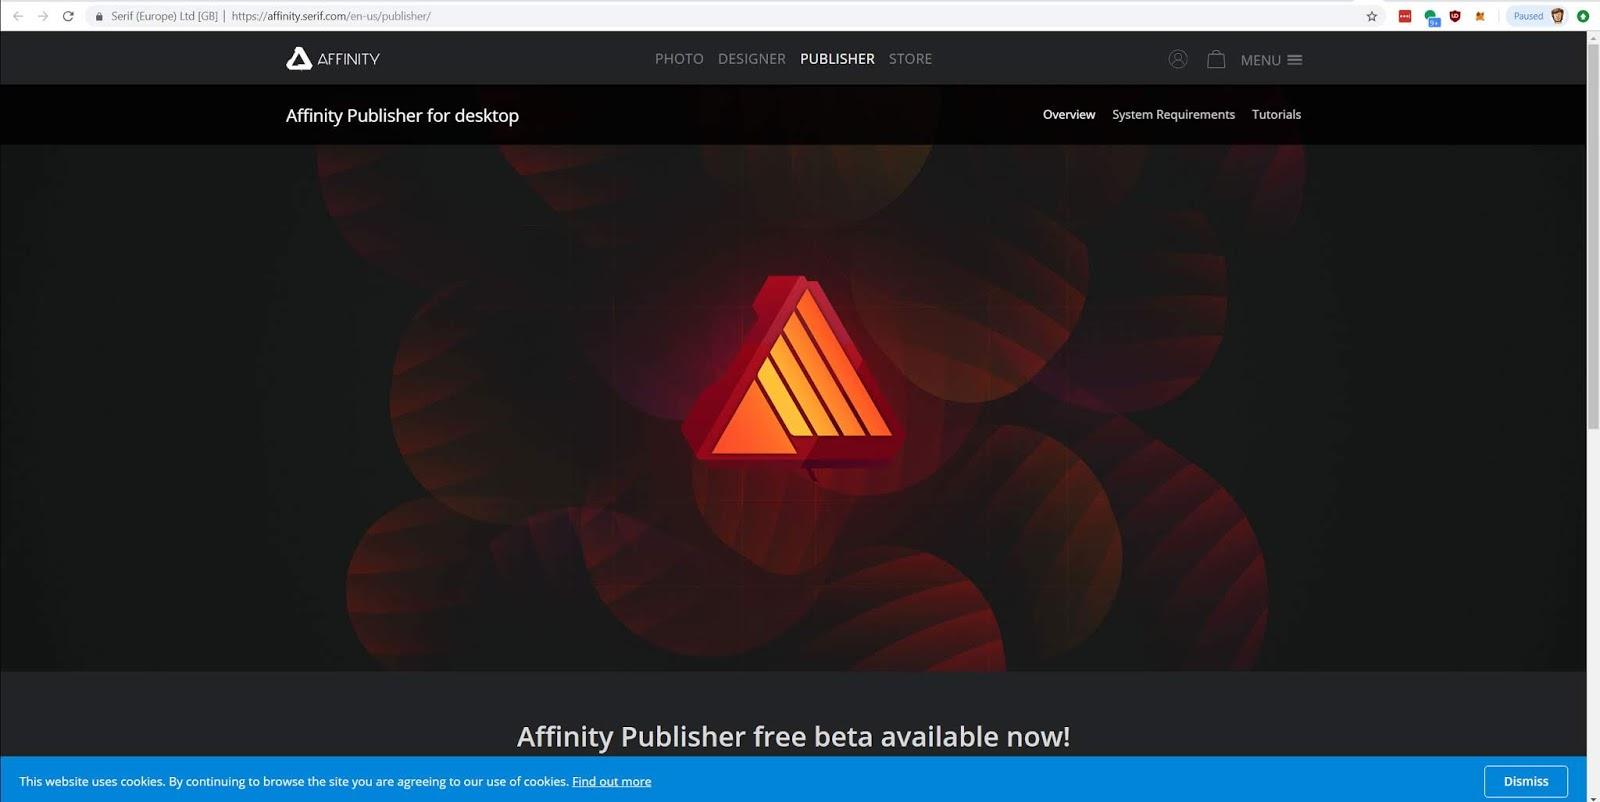 Nattosoup Studio Art and Process Blog: An Alternative to